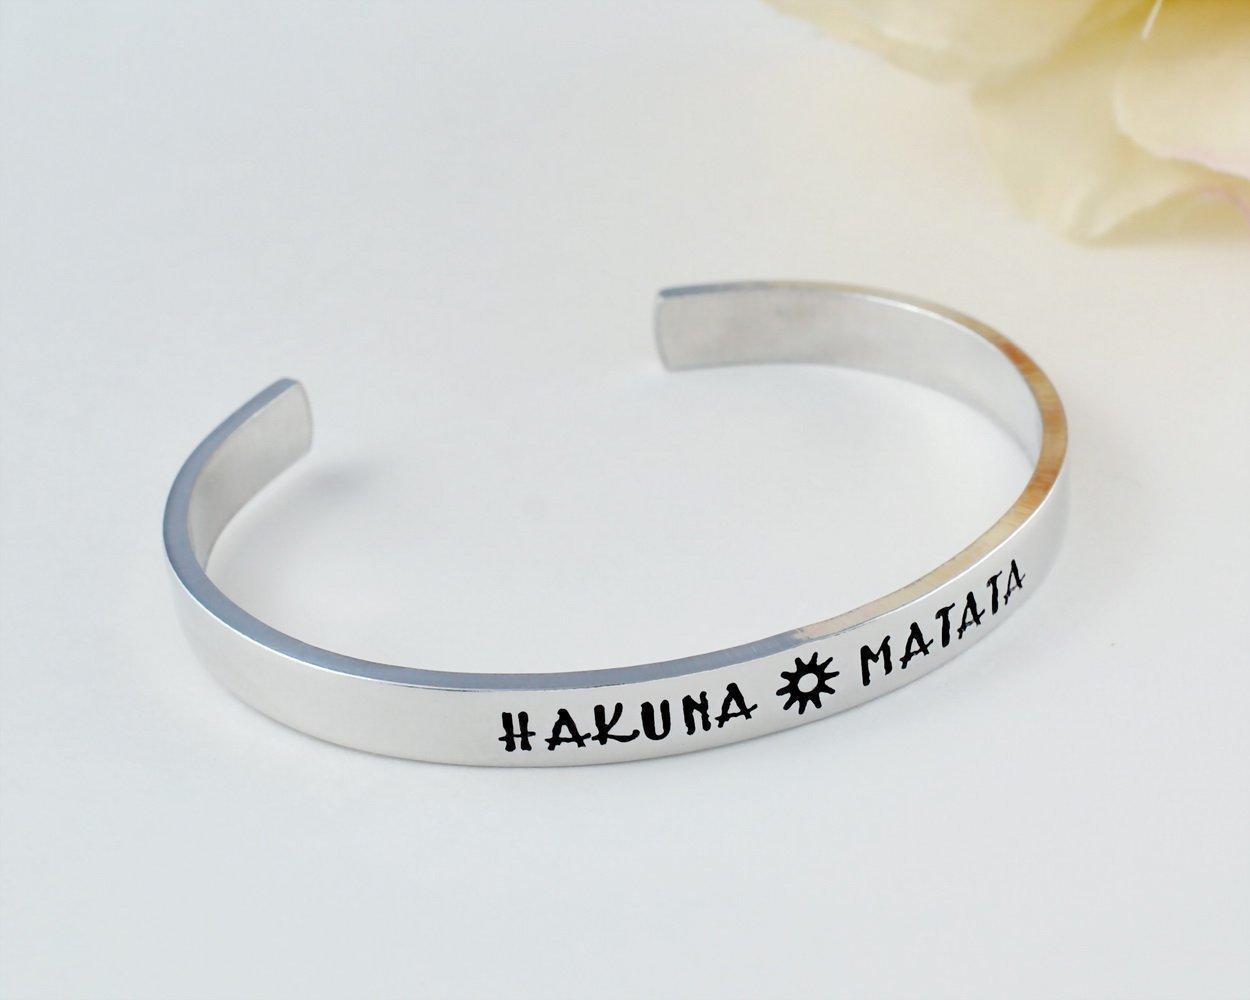 Amazon Hakuna Matata Hand Stamped Aluminum Cuff Bracelet